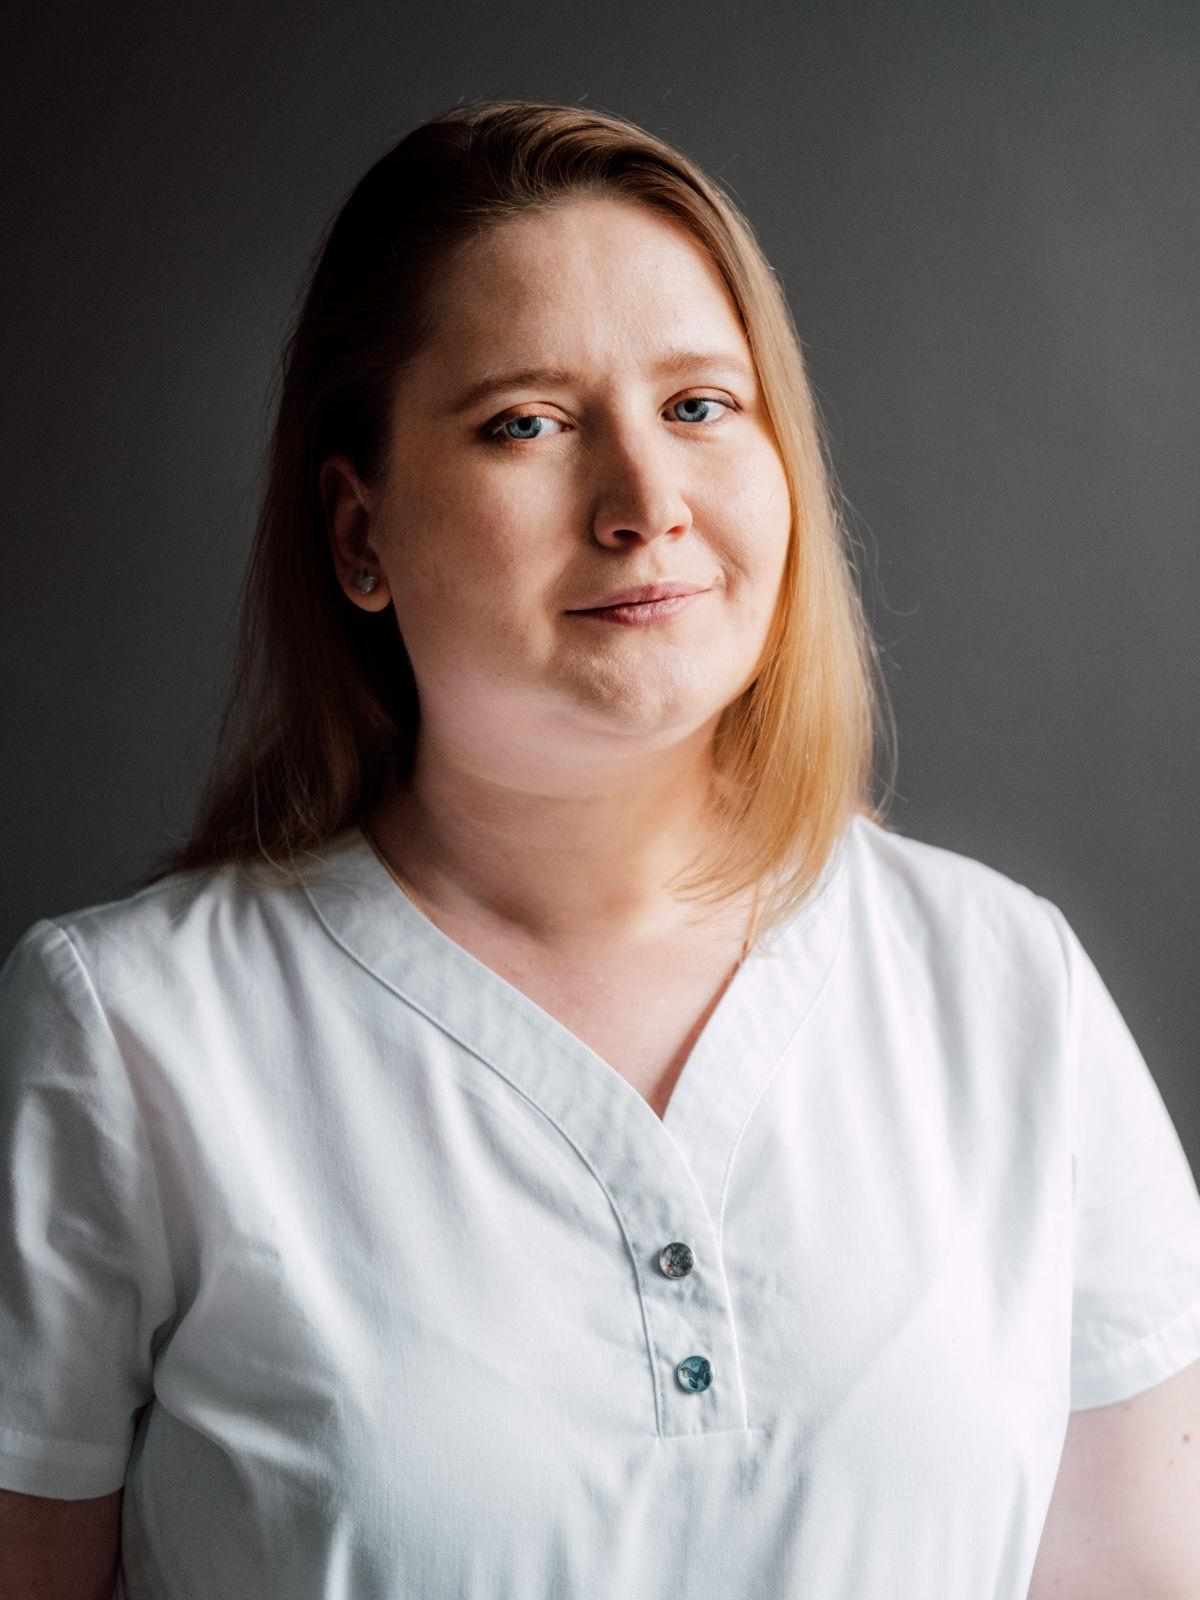 Анастасия Соловьева